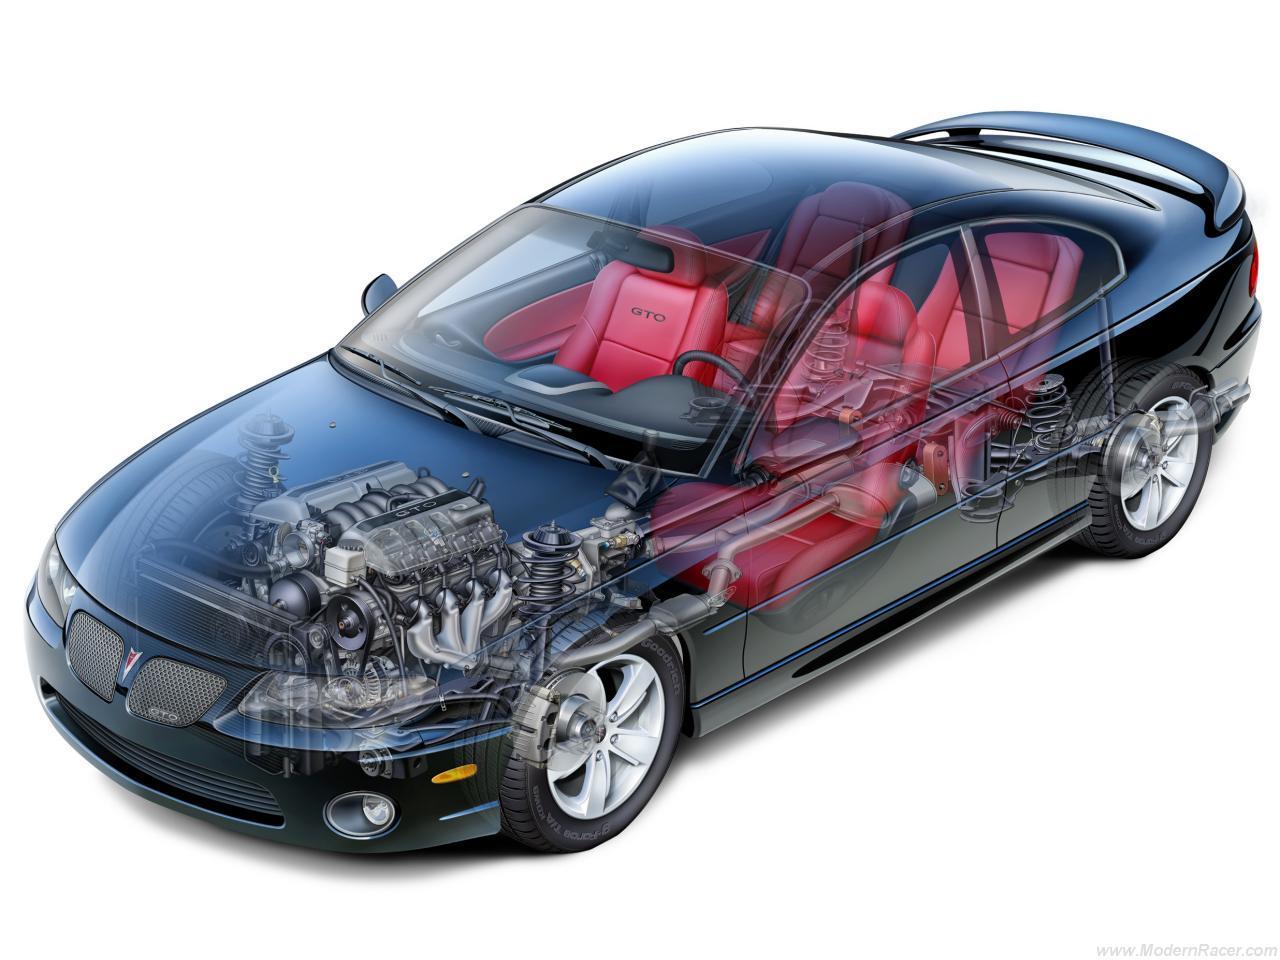 Pontiac Gto Car Cutaway Modern Racer Features